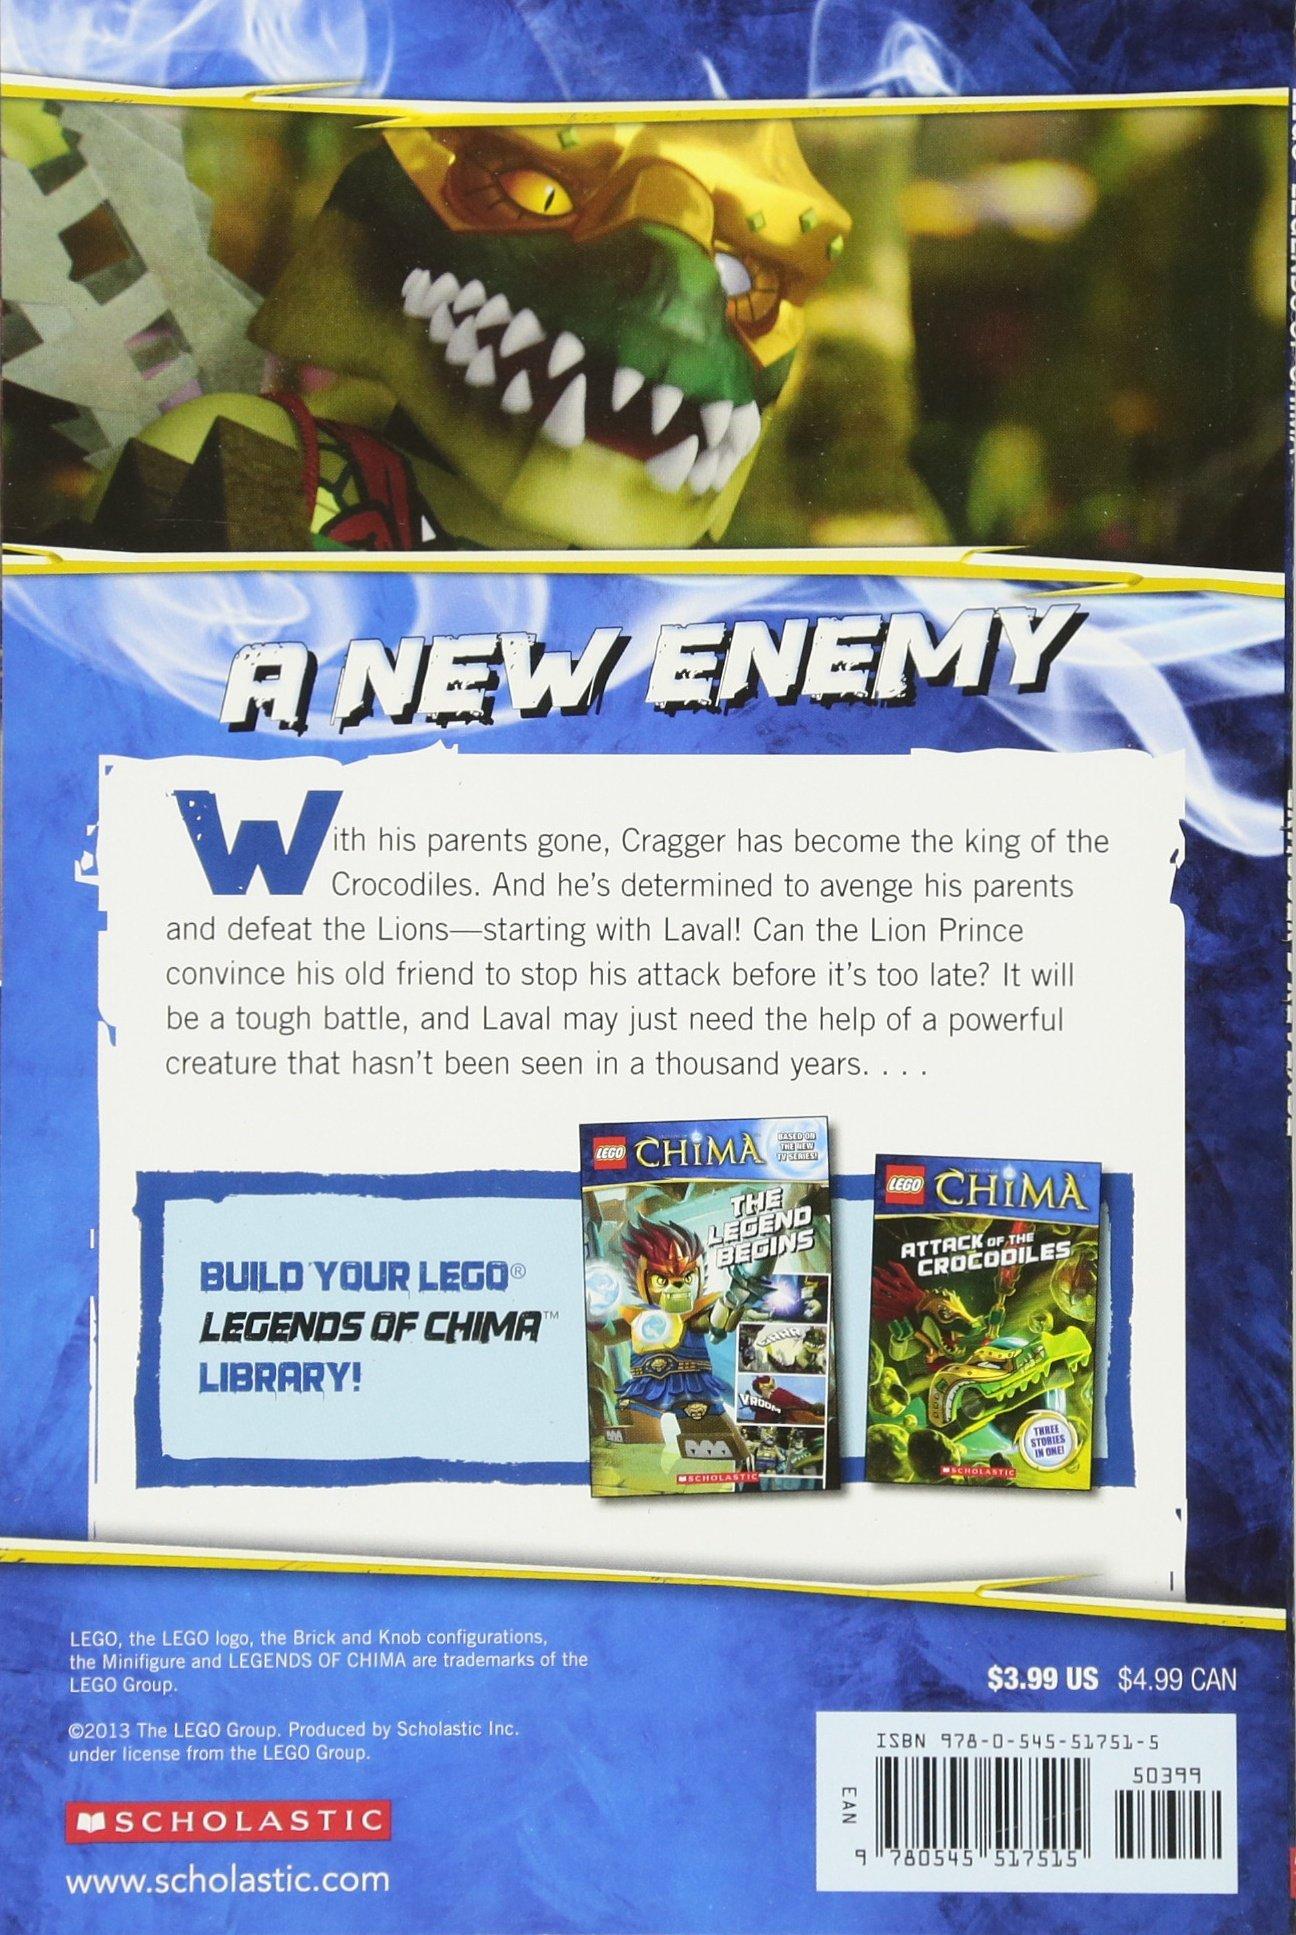 Amazon chima party supplies - Lego Legends Of Chima Cragger S Revenge Comic Reader 2 Trey King 9780545517515 Amazon Com Books